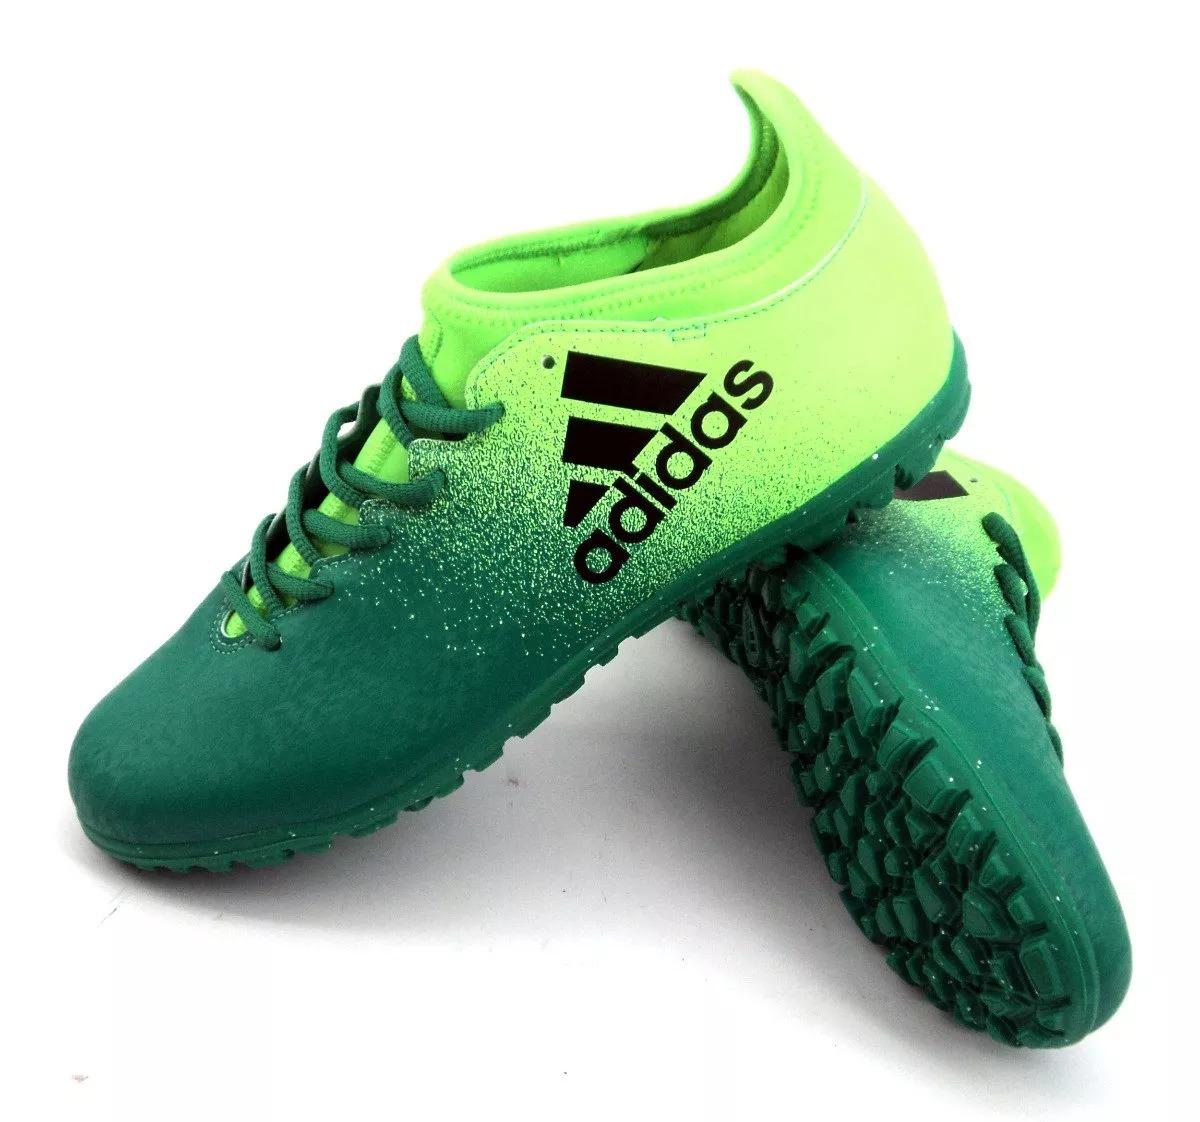 quality design c0569 0064b zapatilla botín adidas x 16.3 tf verde hombre eezap. Cargando zoom.